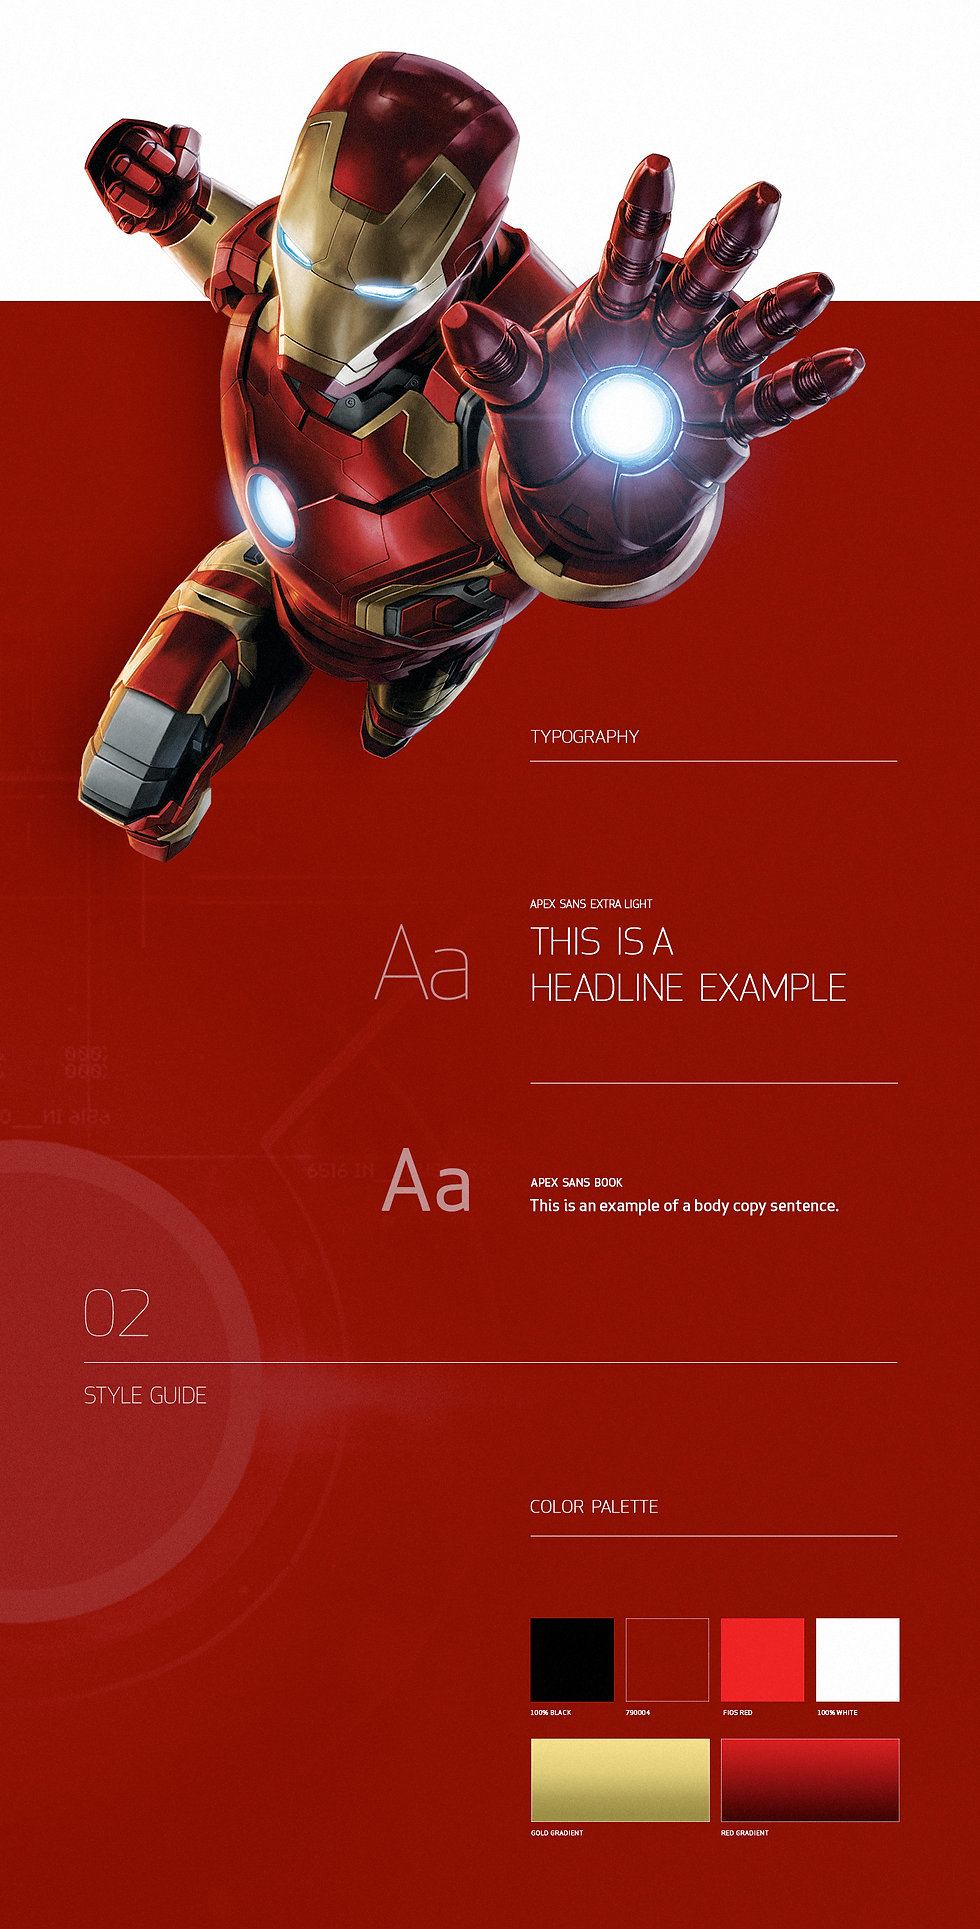 Verizon_Iron_Man_Campaign_113019_Web_03.